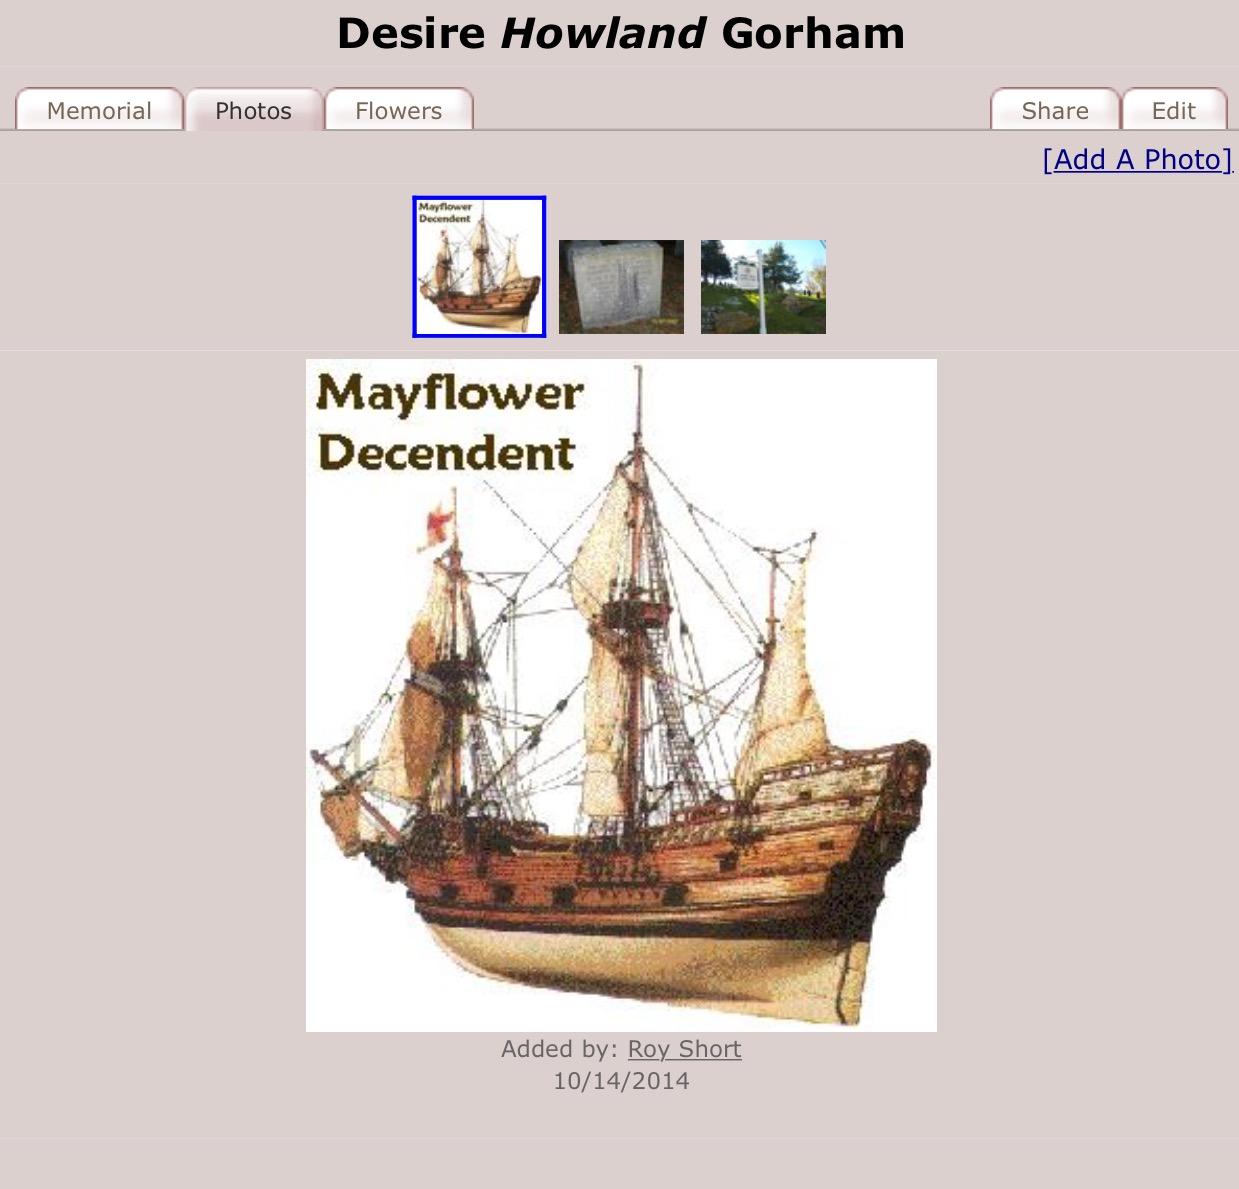 Desire Howland